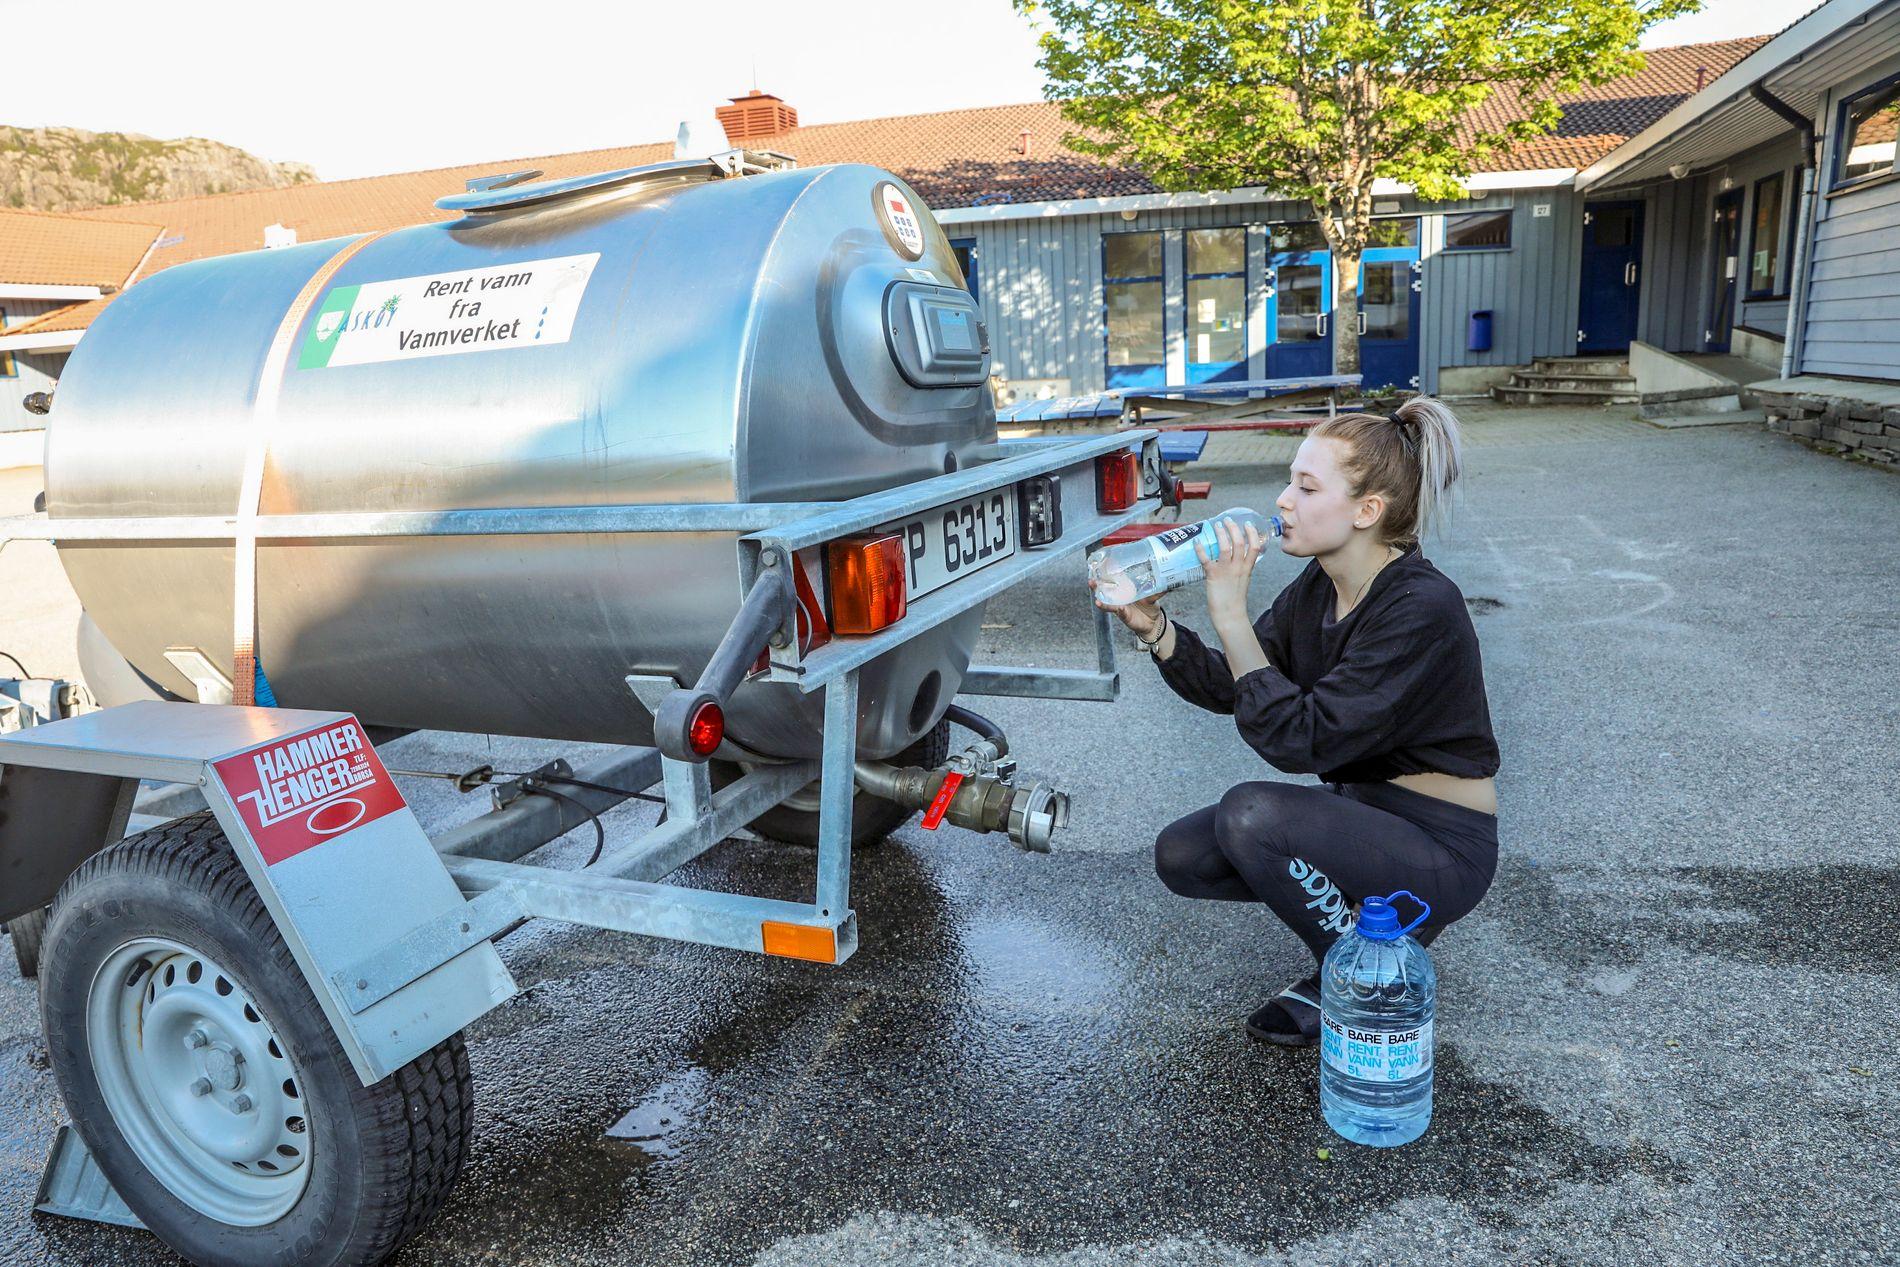 TØRST: Maria Danielsen (16) tar seg en slurk rent vann.